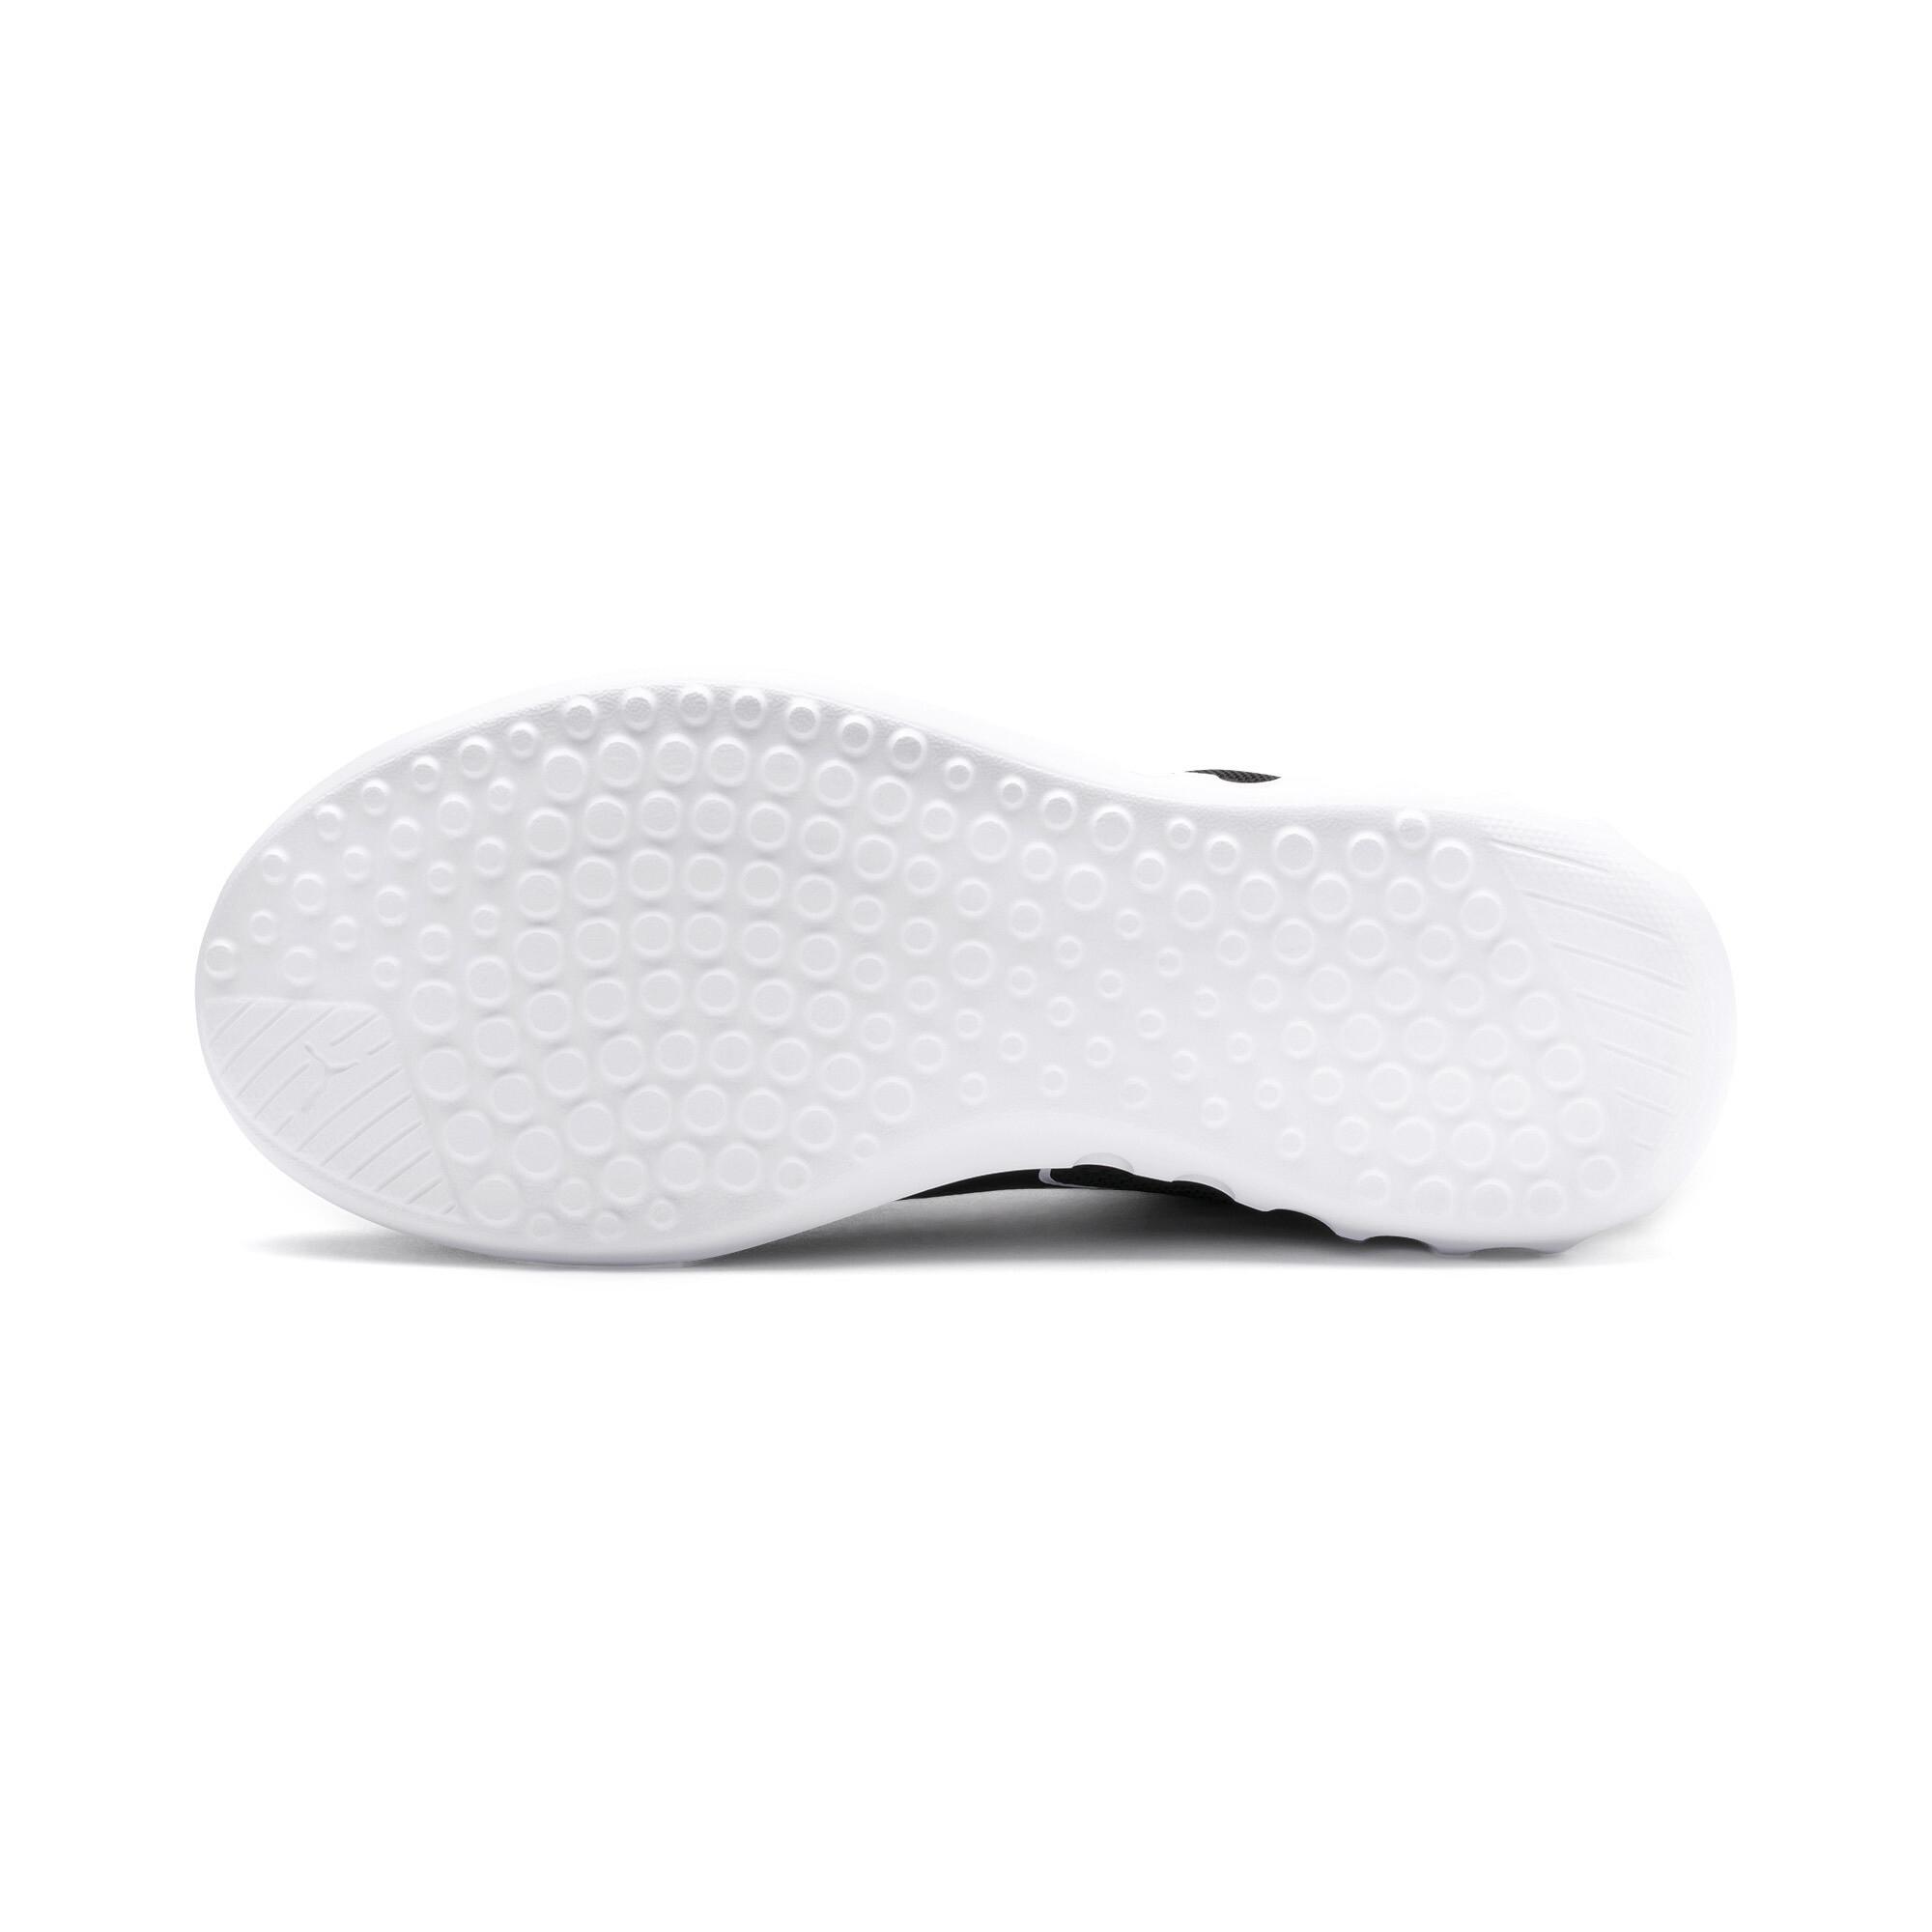 PUMA-Carson-2-Concave-Women-s-Training-Shoes-Women-Shoe-Running thumbnail 17